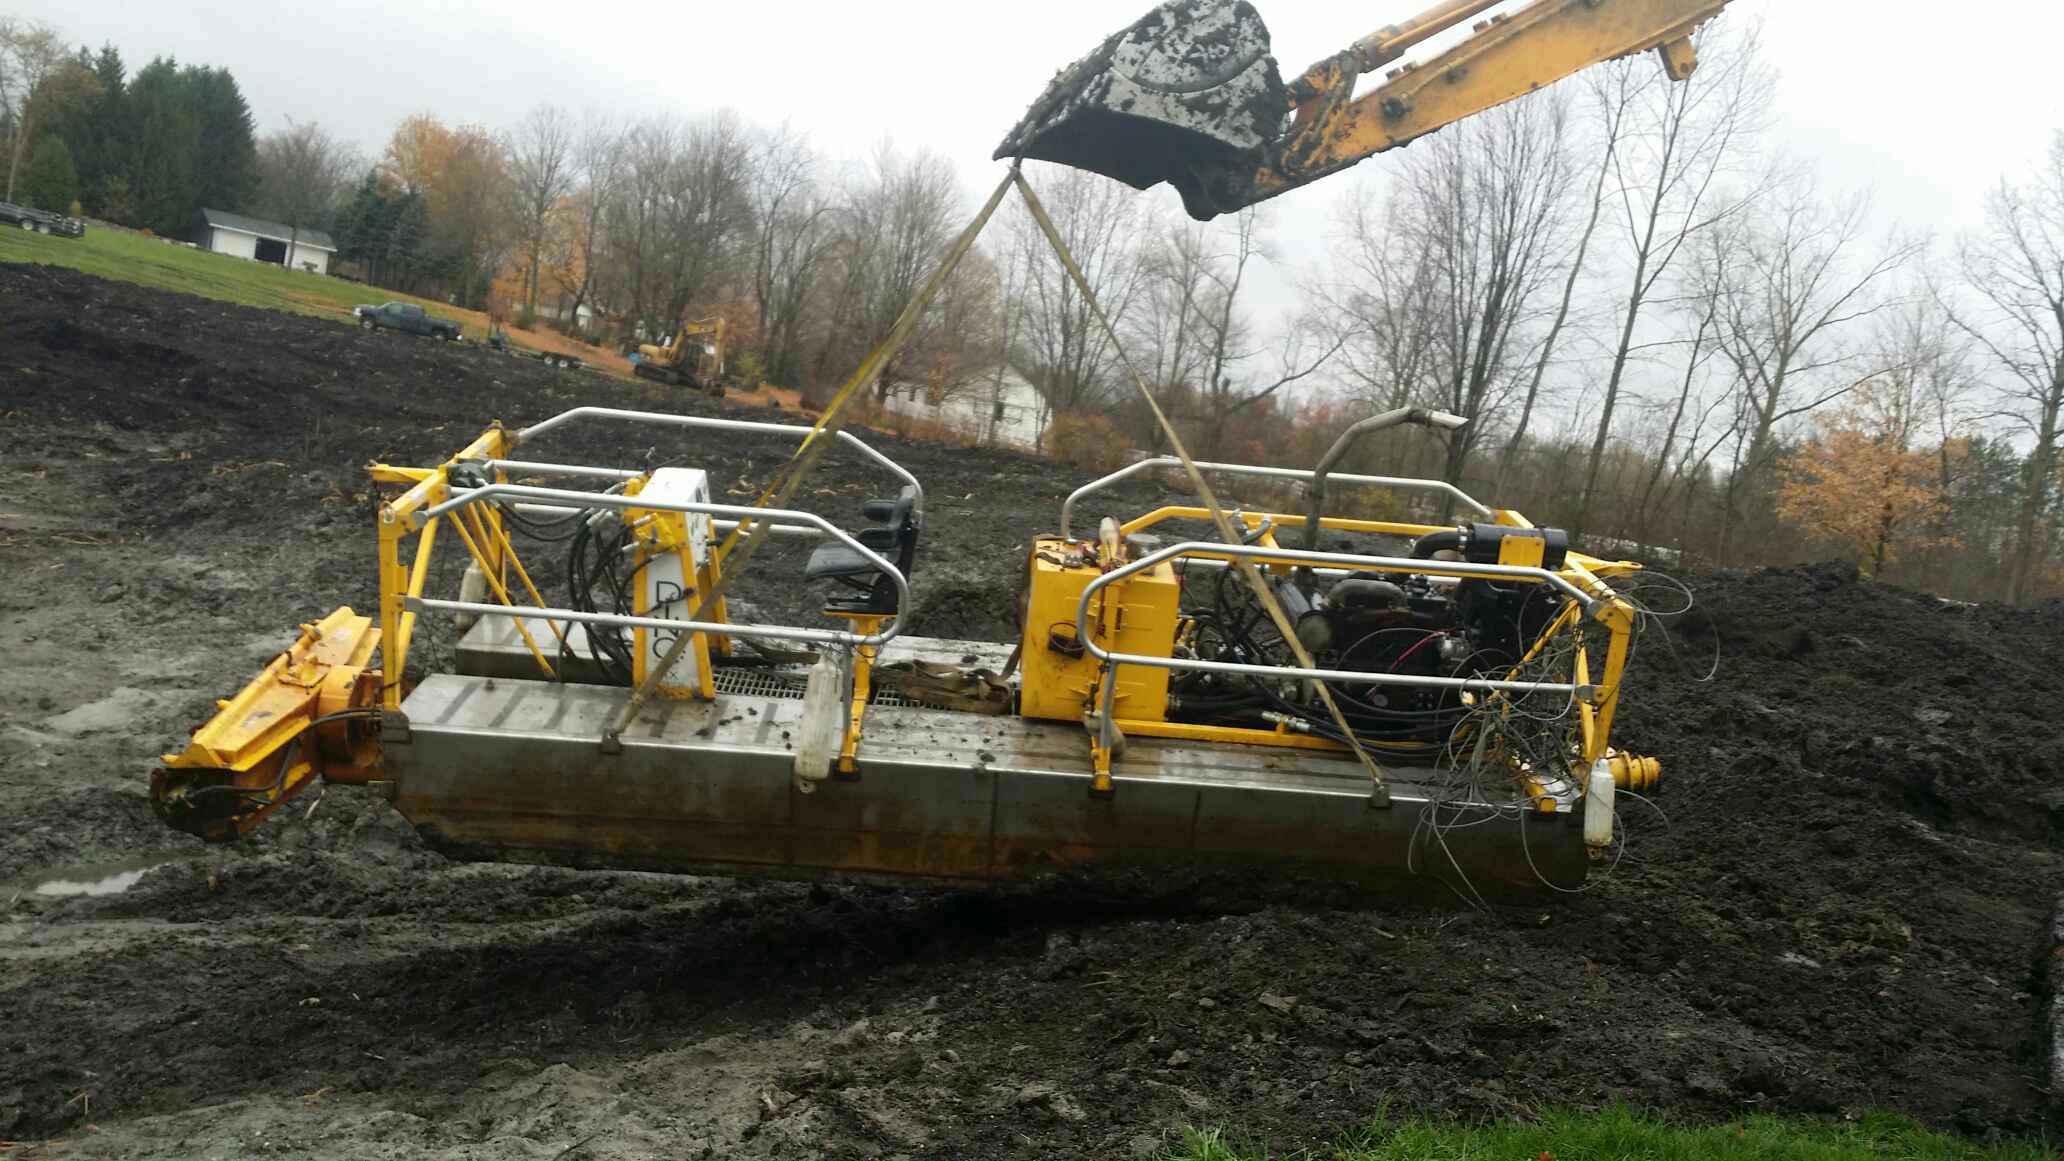 fish_pond_excavation_Plymouth_Michigan_7.jpg